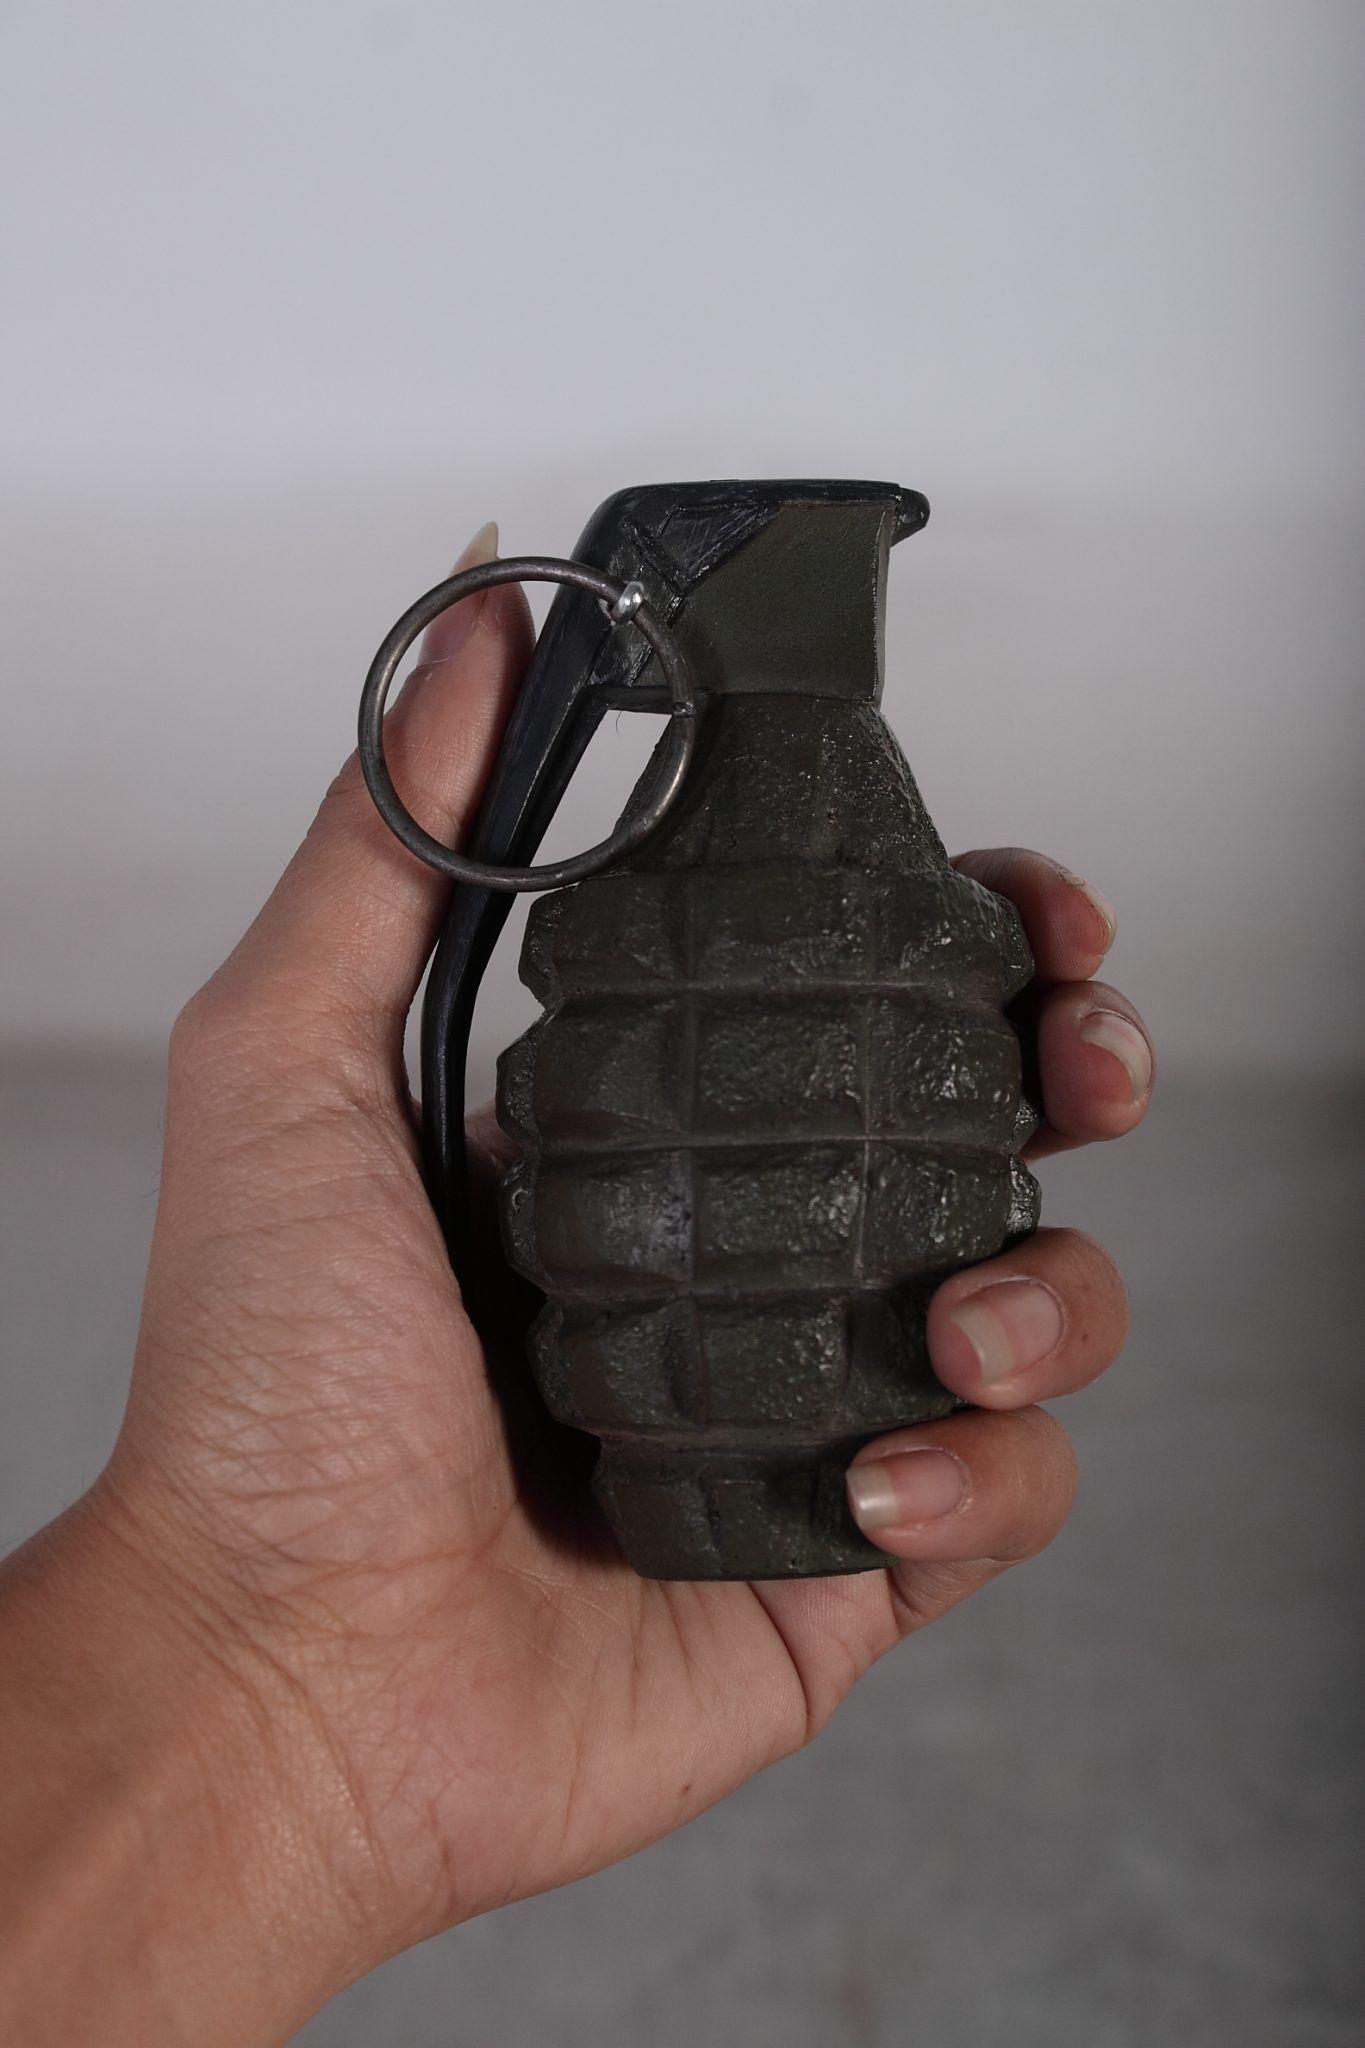 Pineapple grenade resin replica WWII GRENADE, INERT  HAS NO